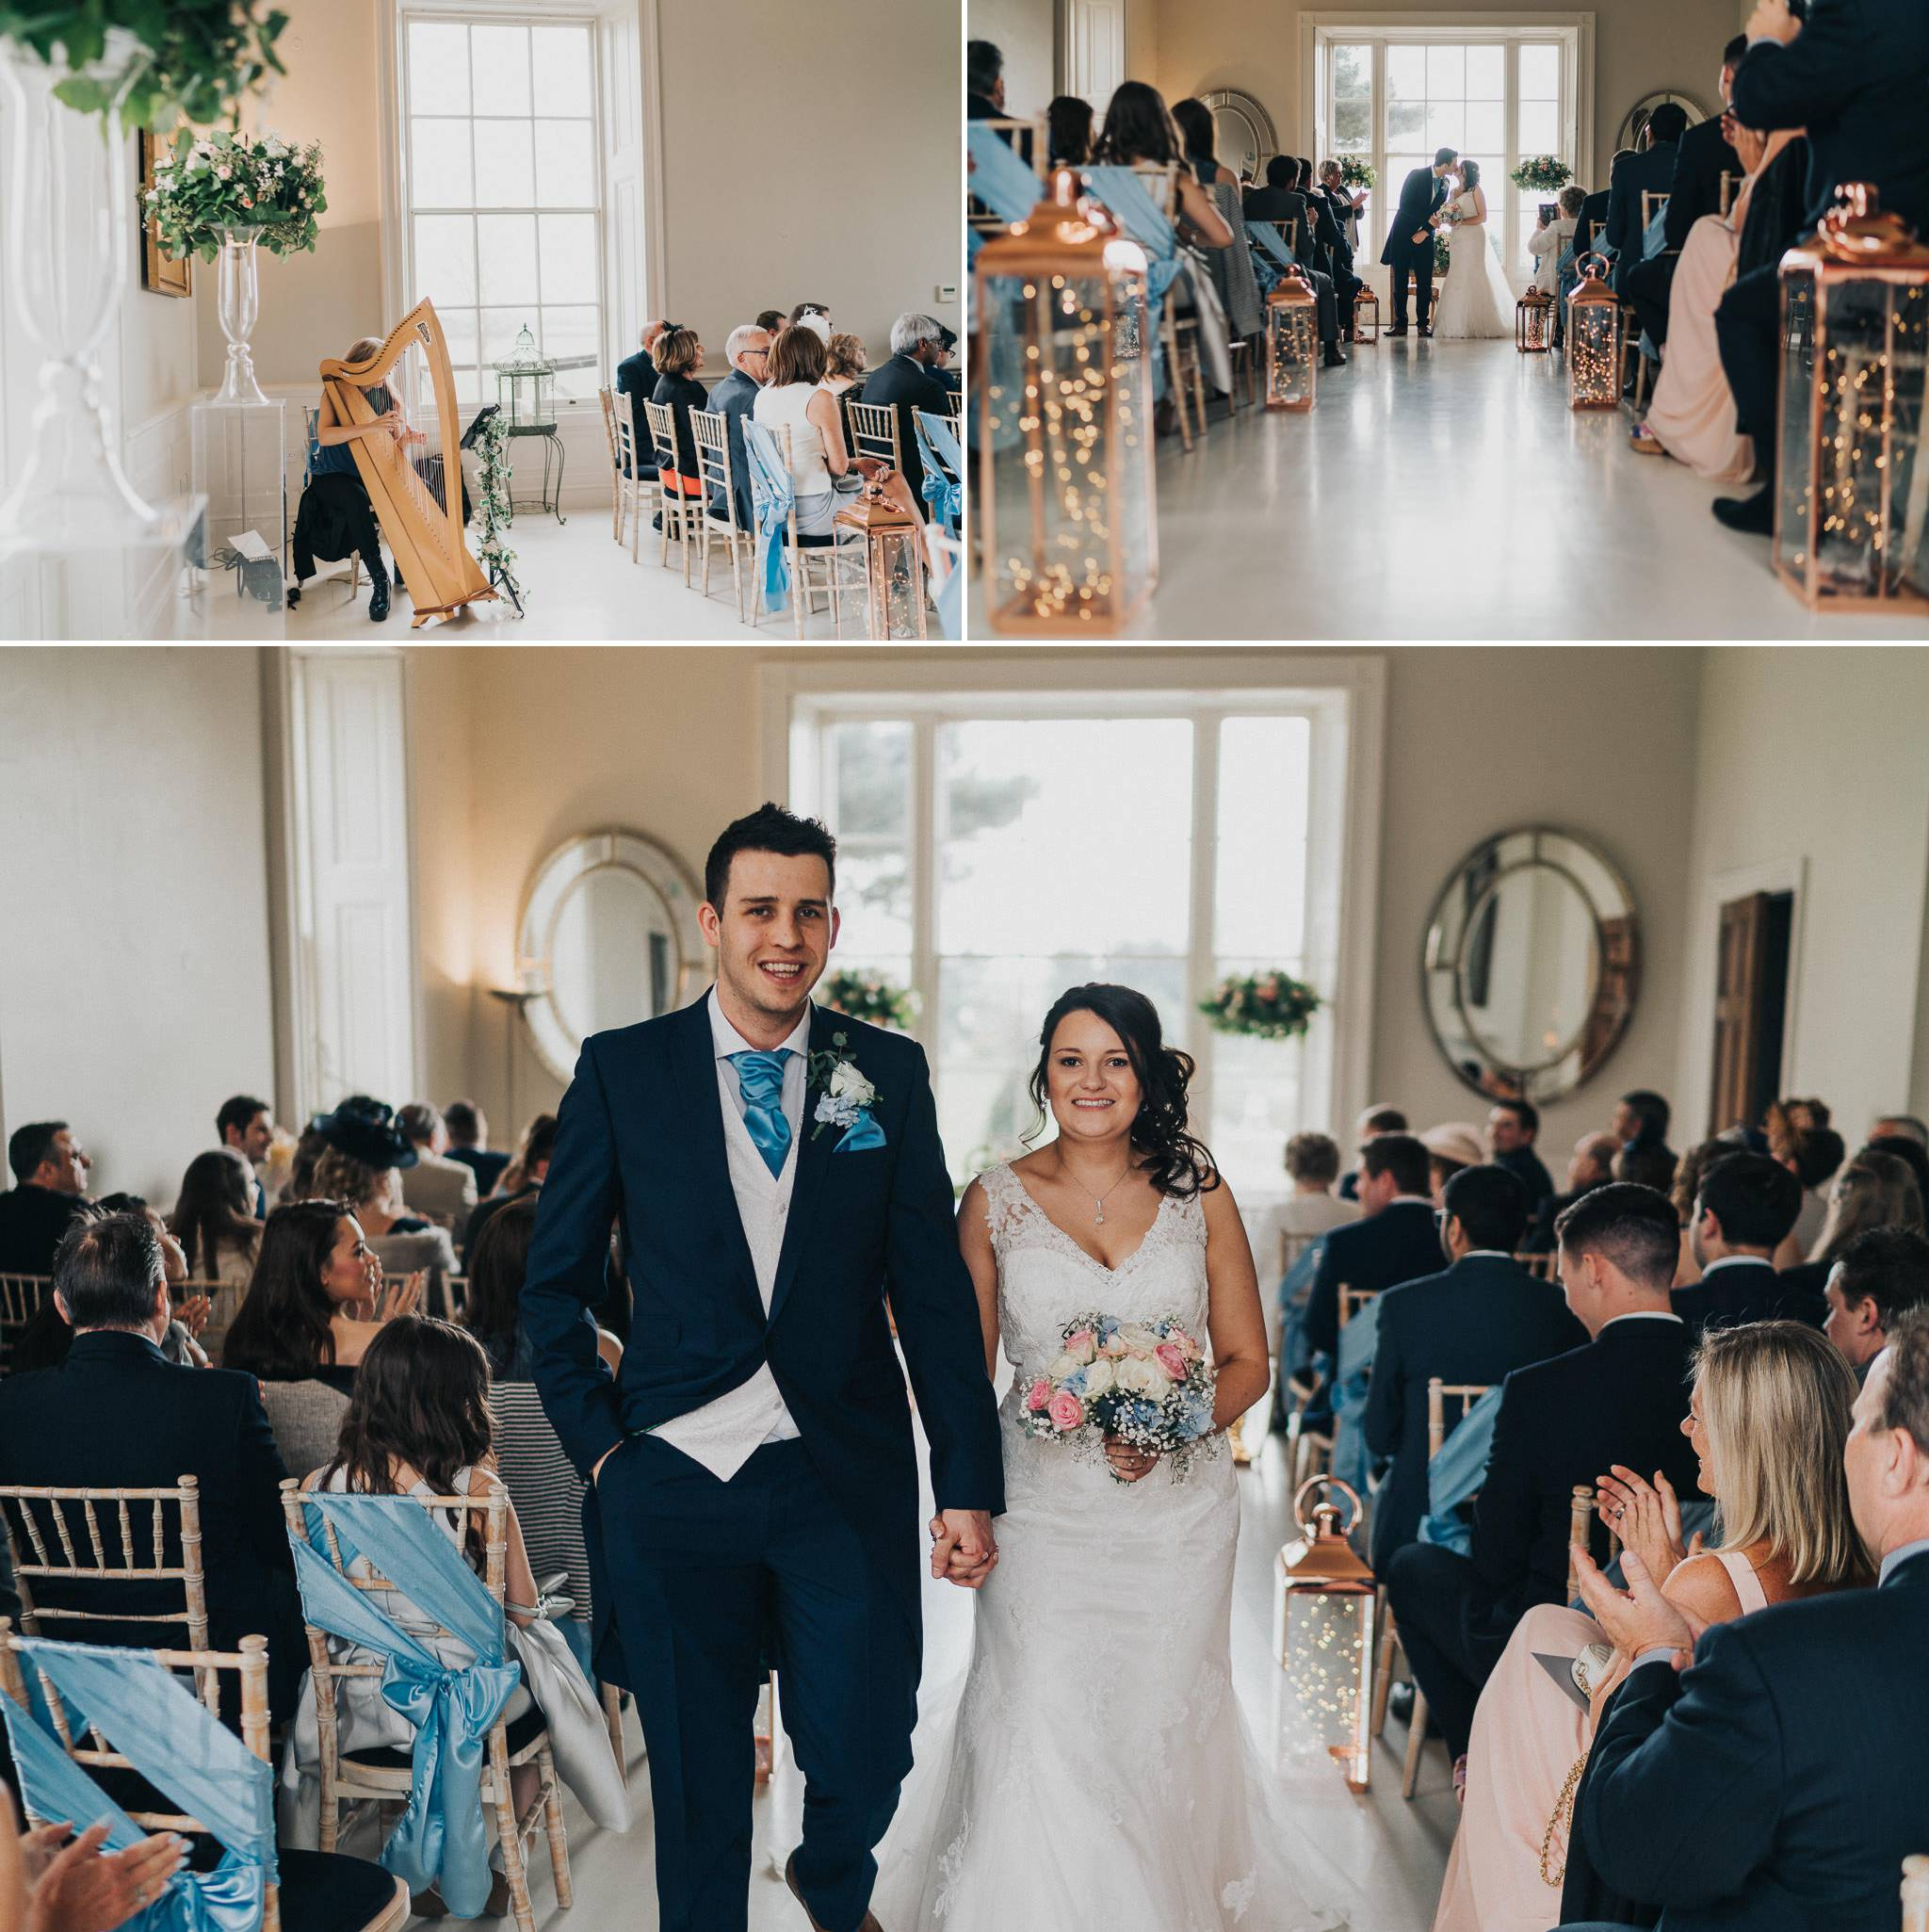 stubton-hall-wedding-photography 10.jpg